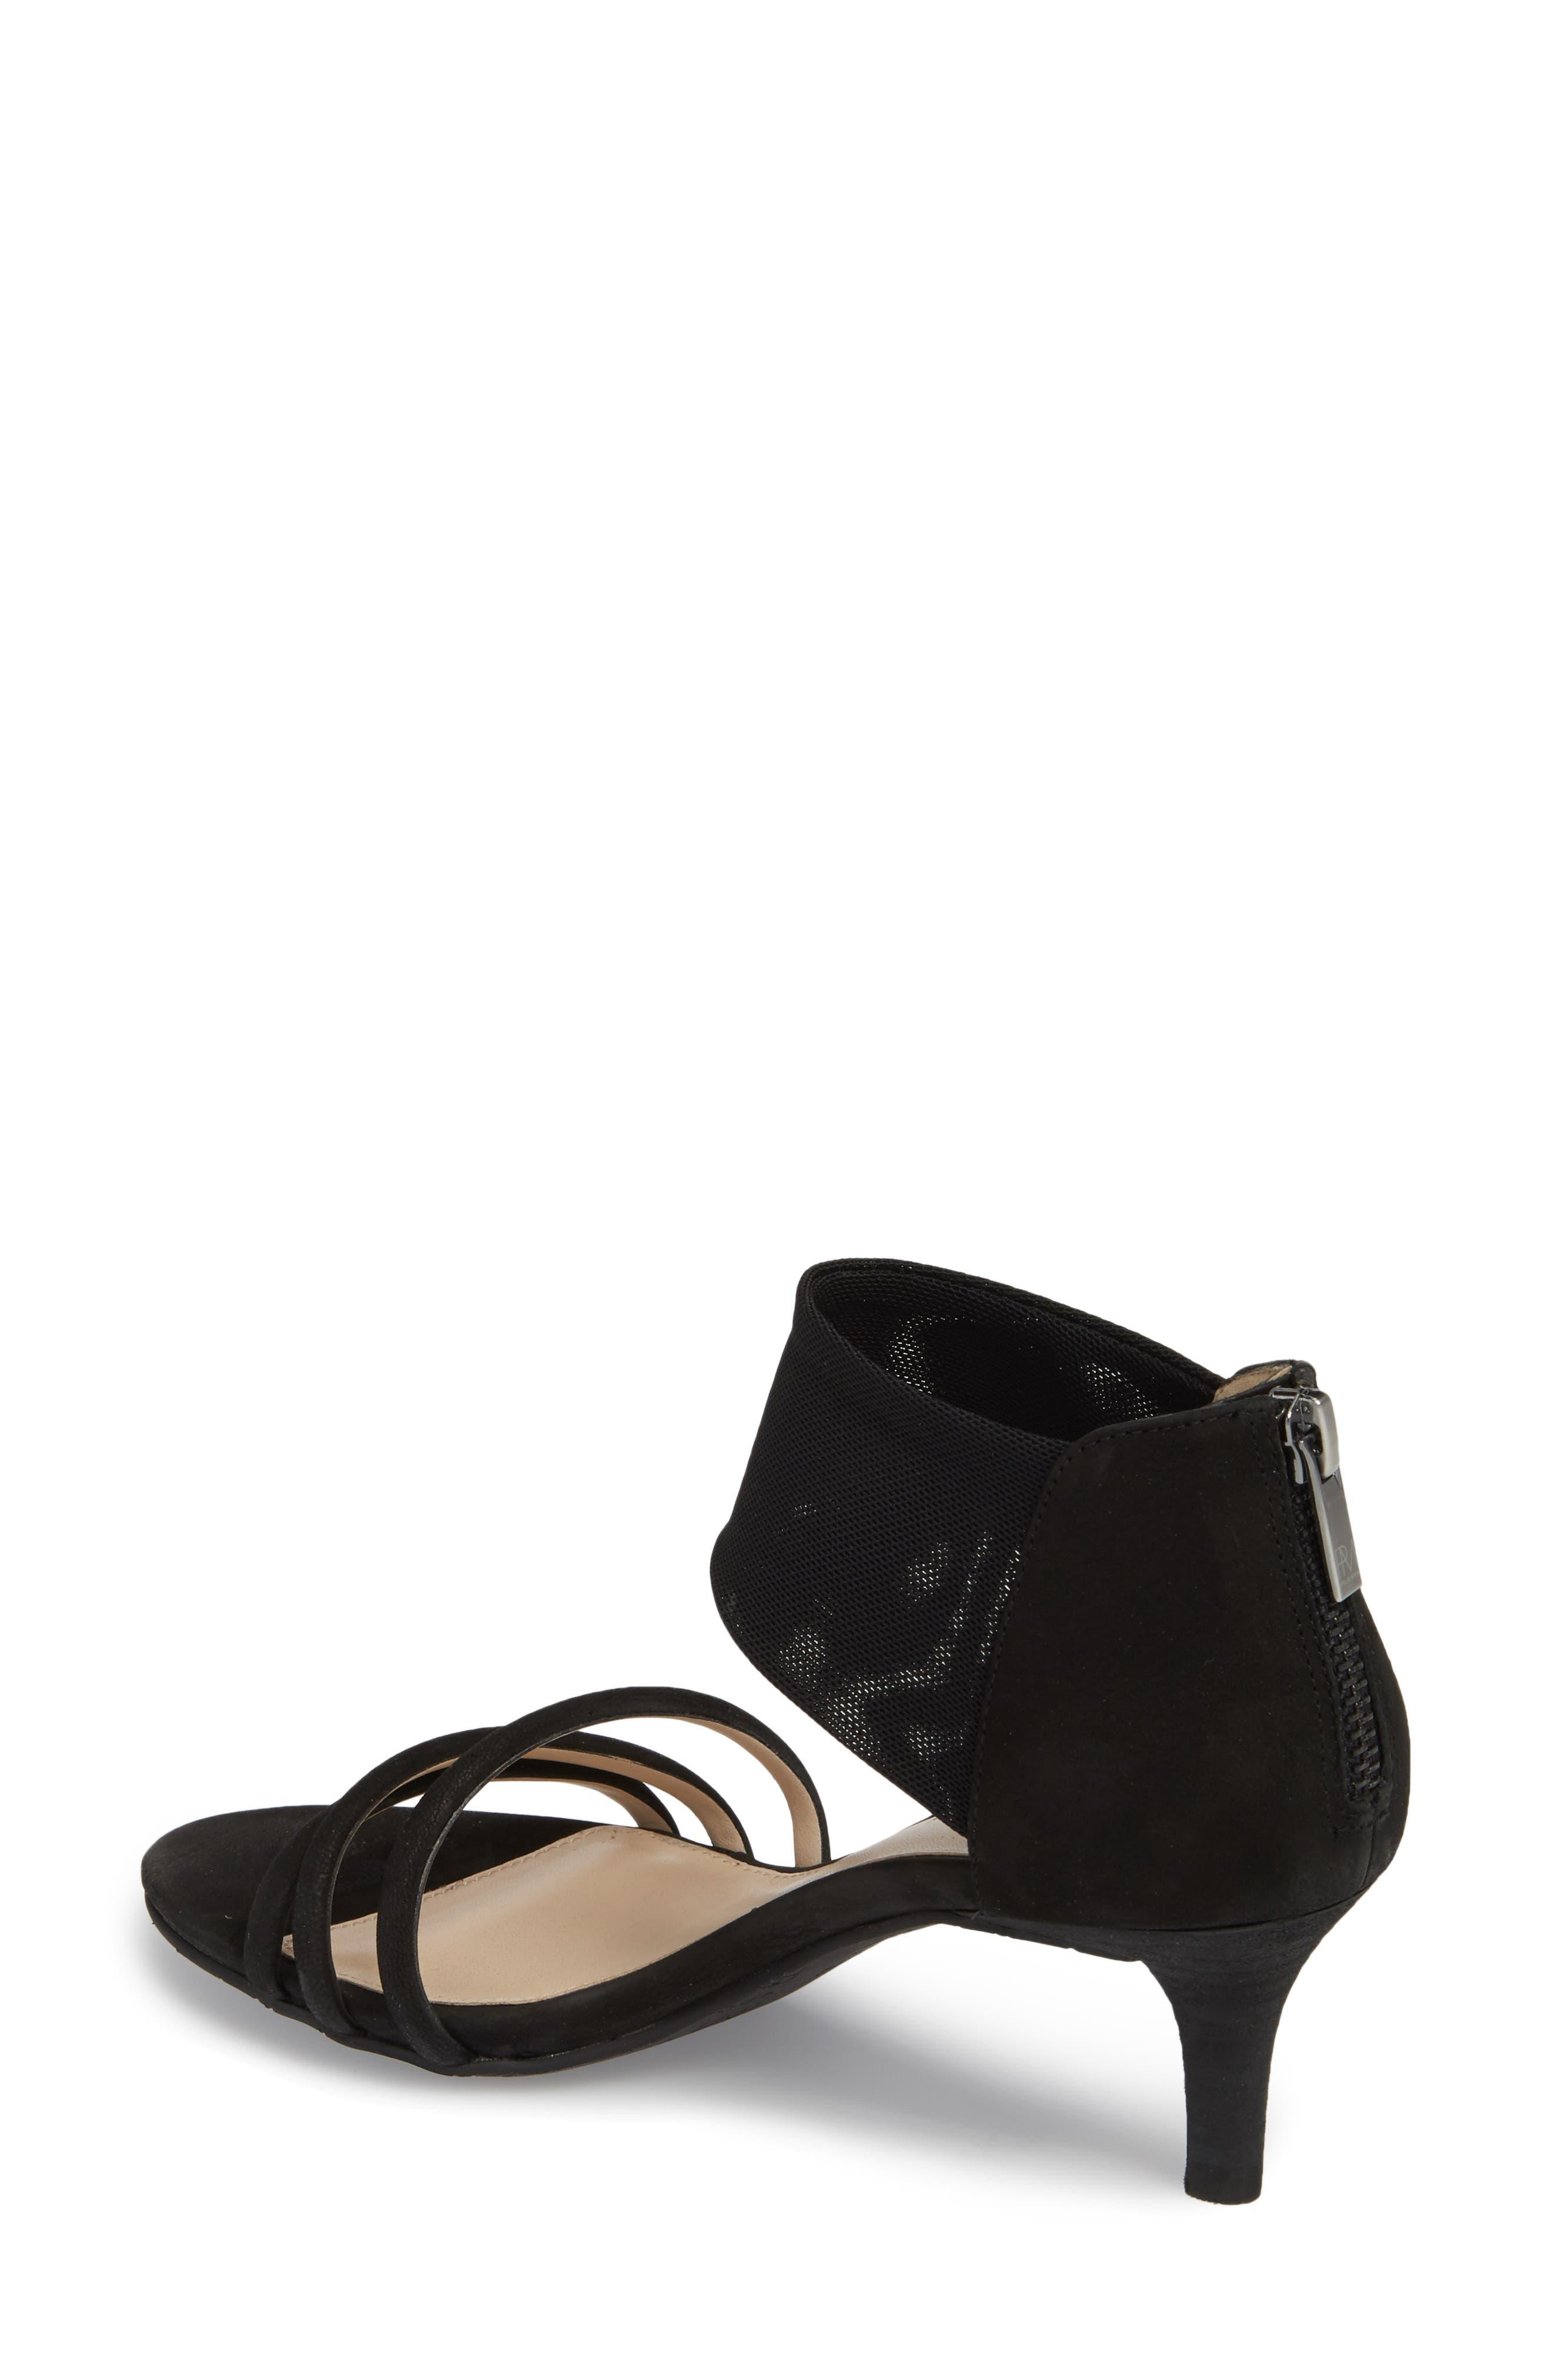 Berri Ankle Cuff Sandal,                             Alternate thumbnail 4, color,